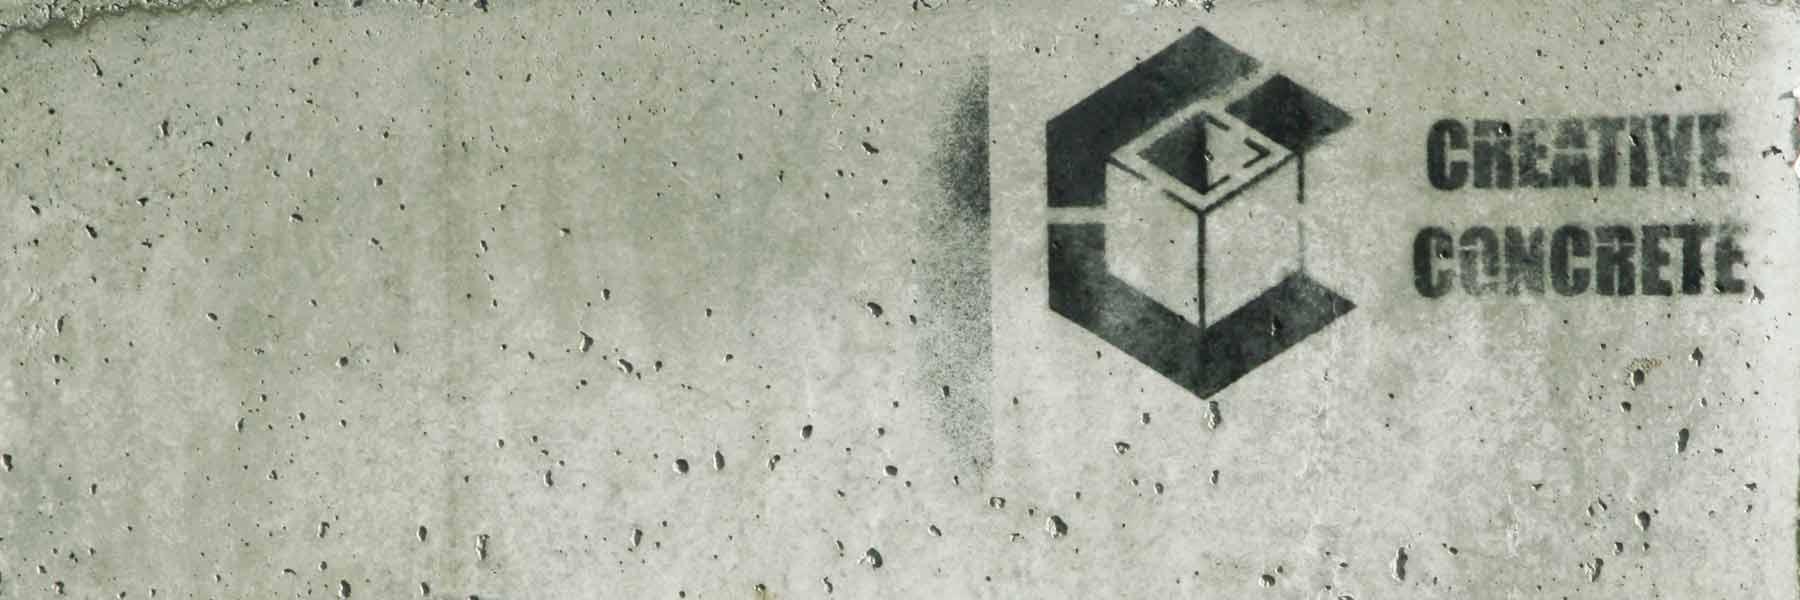 Creative Concrete sprayed logo on concrete1800 600 slider